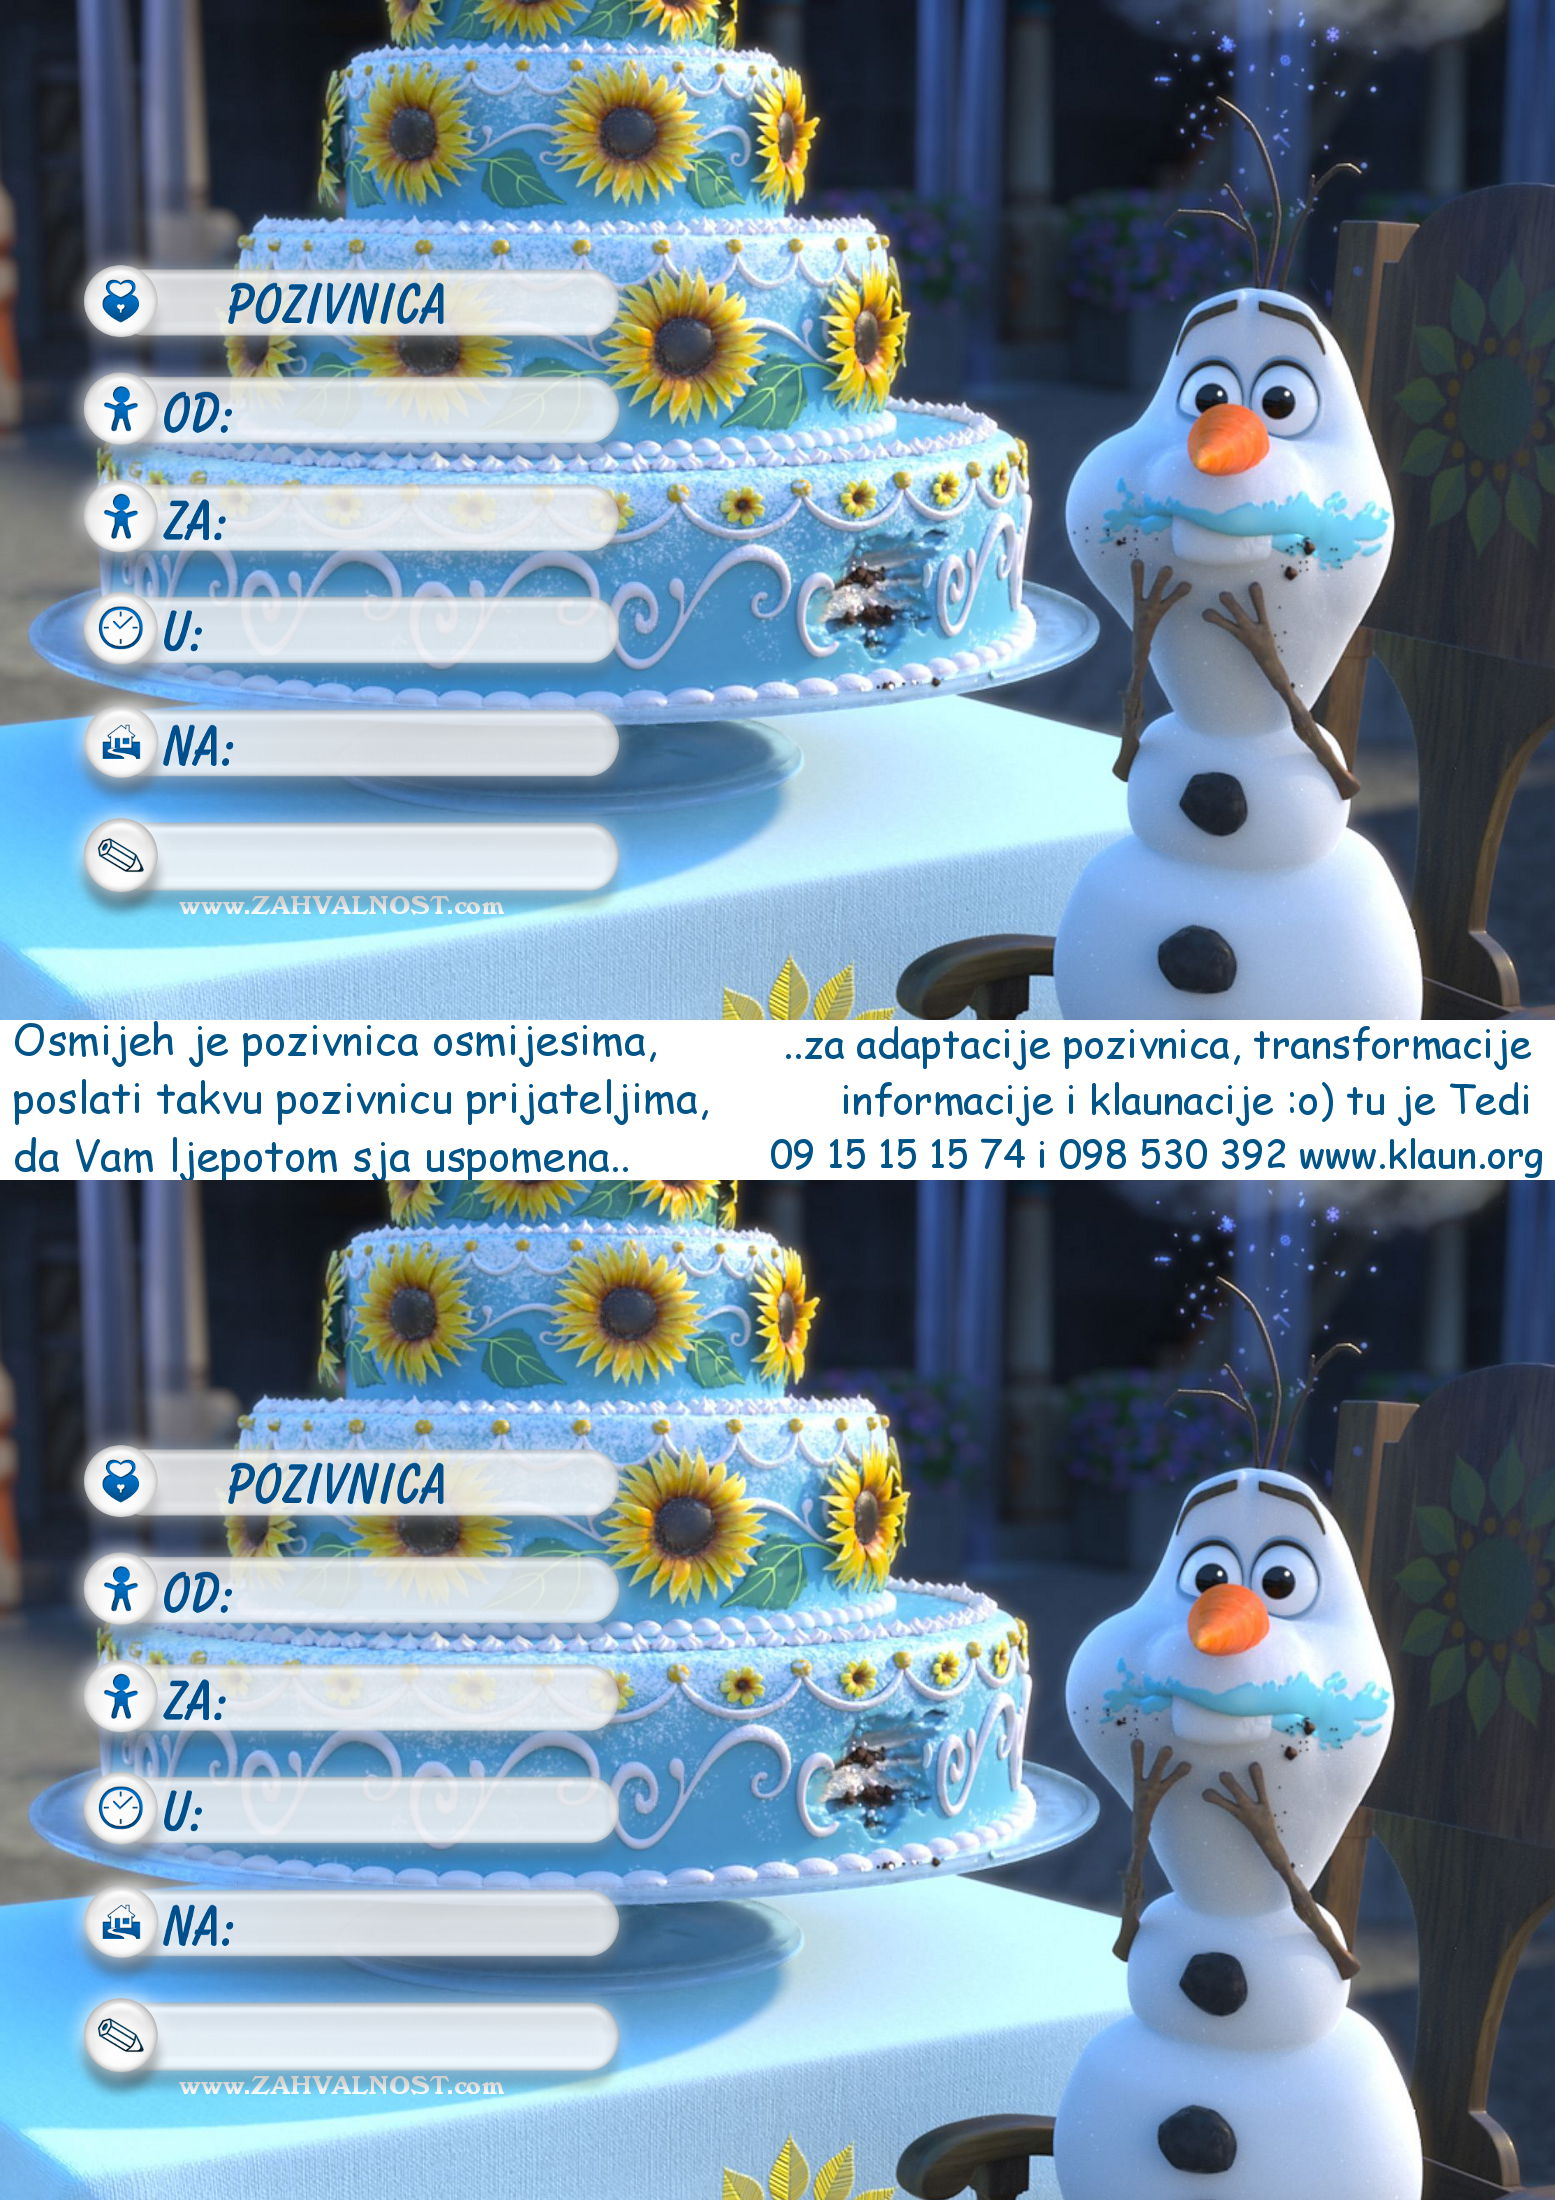 klaun za rođendan Index of /za rodjendan/Pozivnice za rodjendan Frozen Snjezno  klaun za rođendan